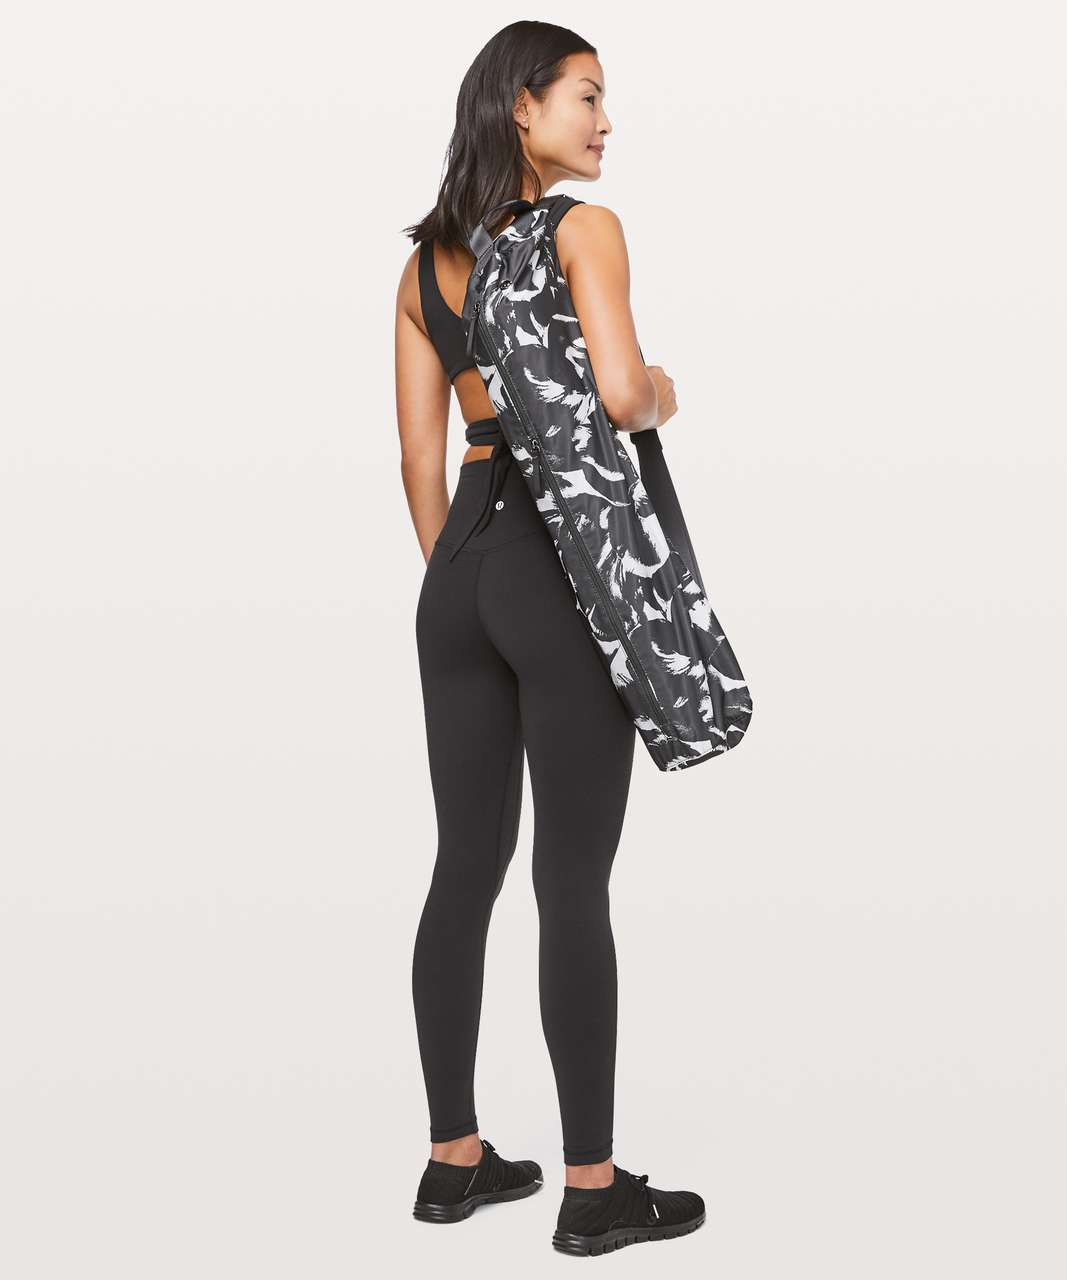 Lululemon Get Rolling Yoga Mat Bag *17L - Midi Flower Pop Starlight Deep Coal